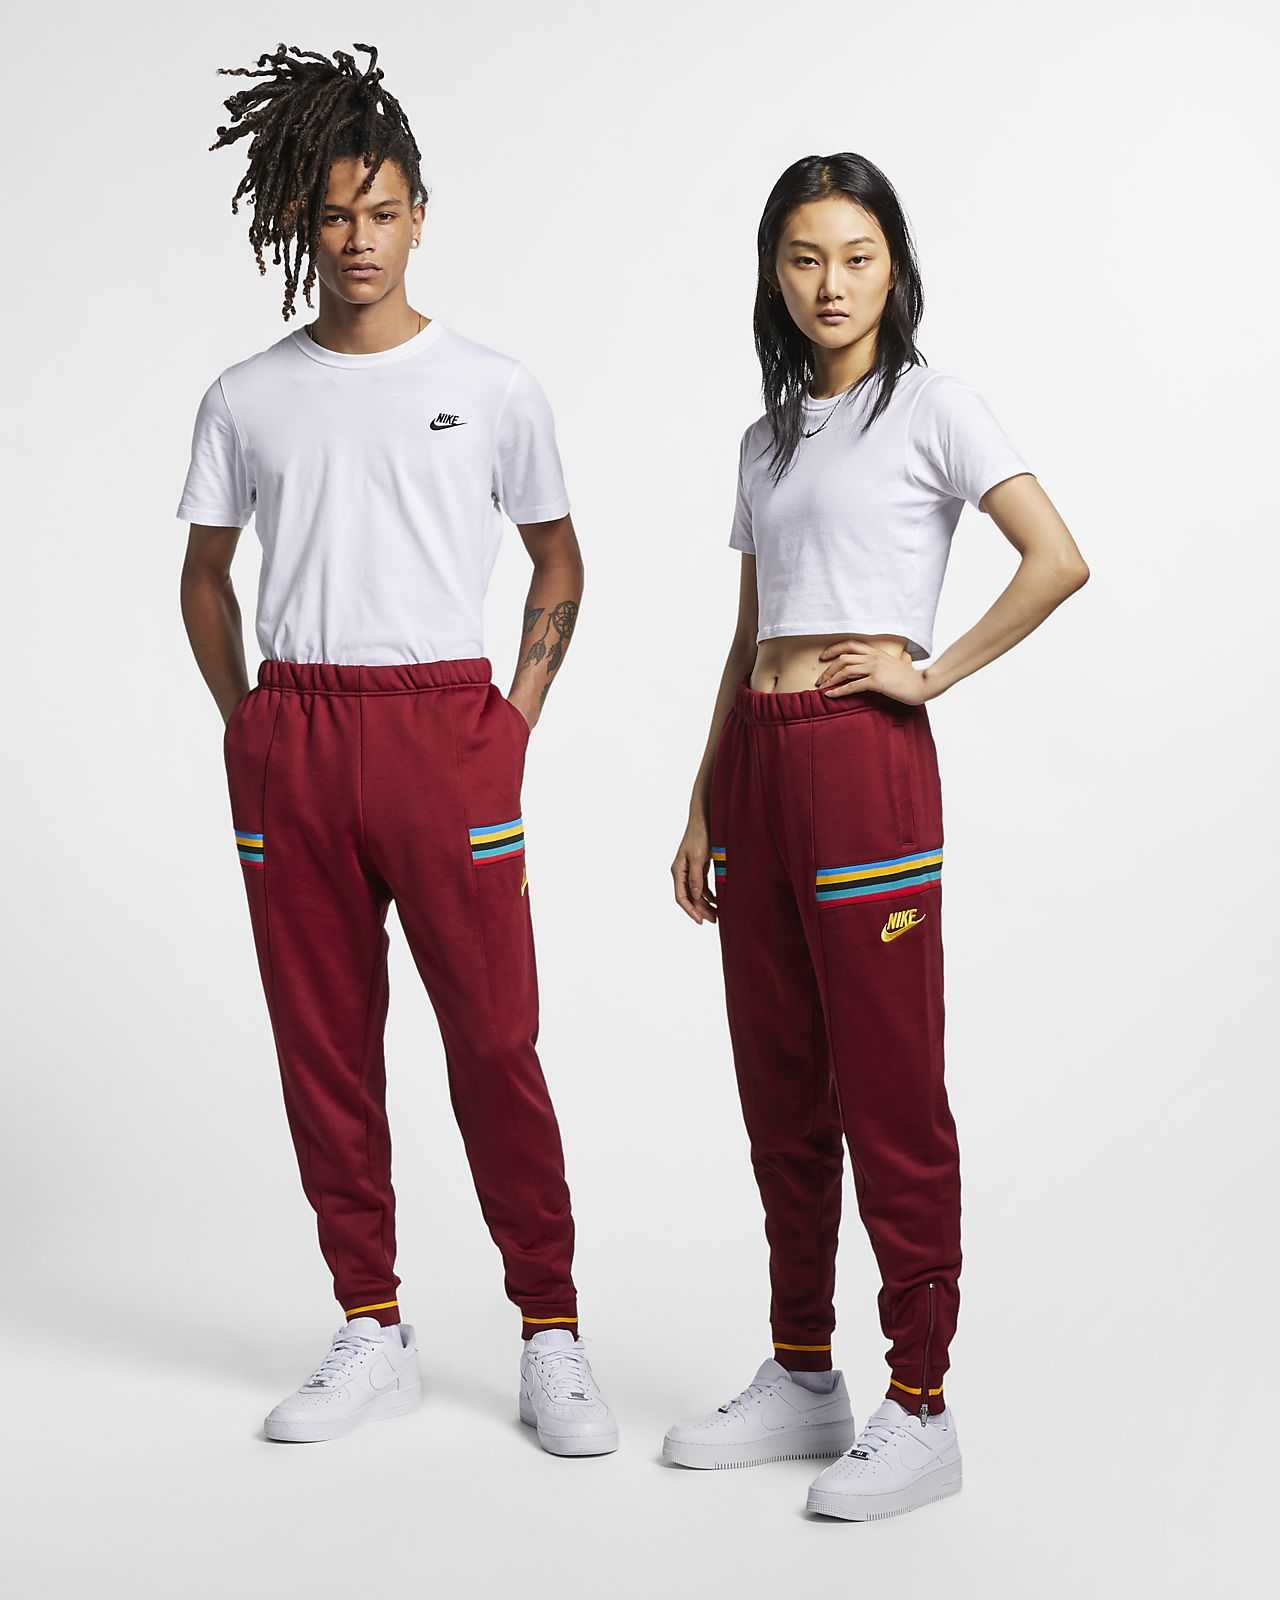 Molleton En Sportswear Pantalon Pantalon En Sportswear Nike Nike Pantalon Nike En Molleton Molleton vn0OPmyN8w